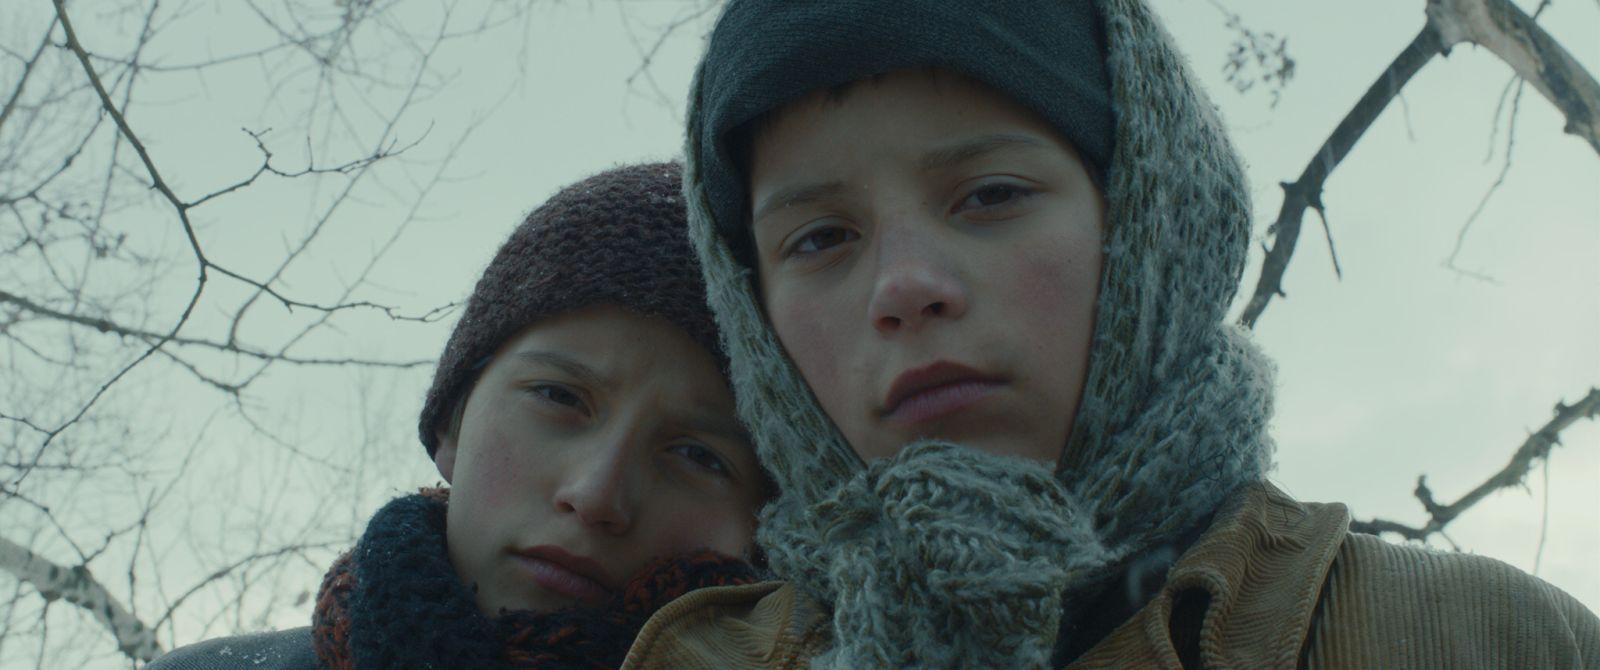 Il grande quaderno: László Gyémánt e András Gyémánt in un'immagine del film